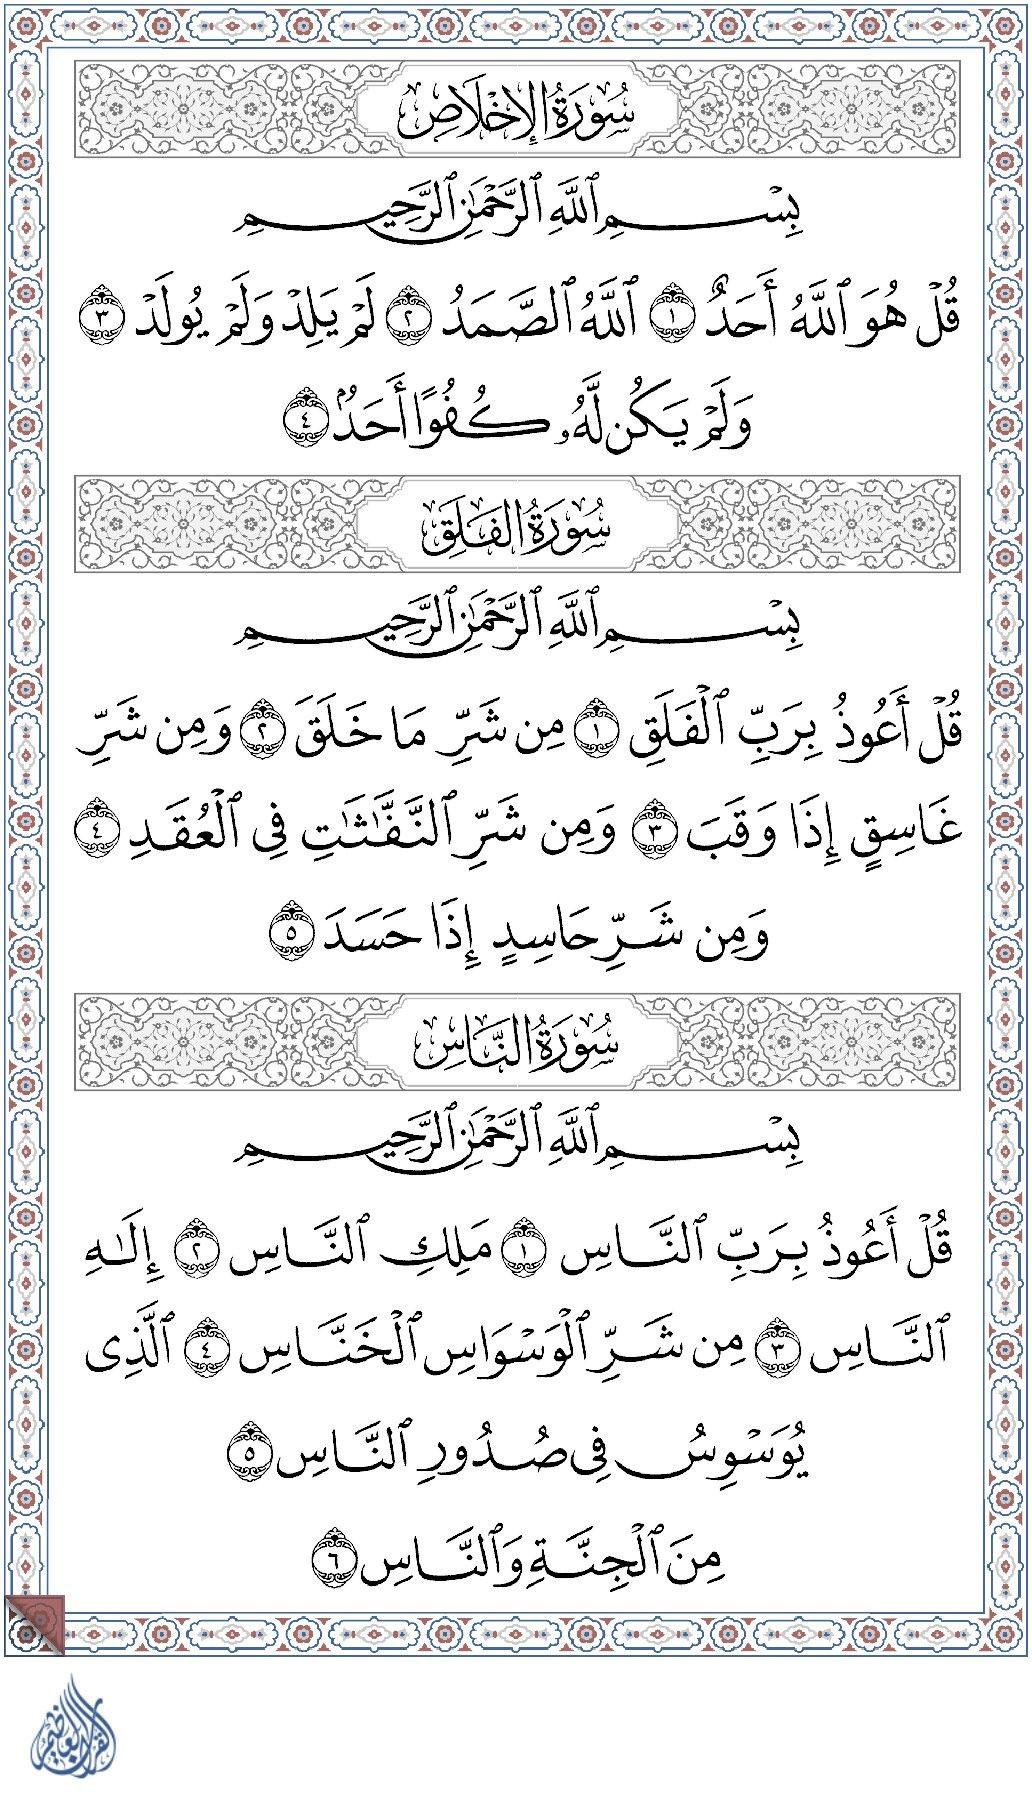 Pin By Boumediene Kader On آيات القرءان الكريم Quran Verses Islamic Quotes Holy Quran